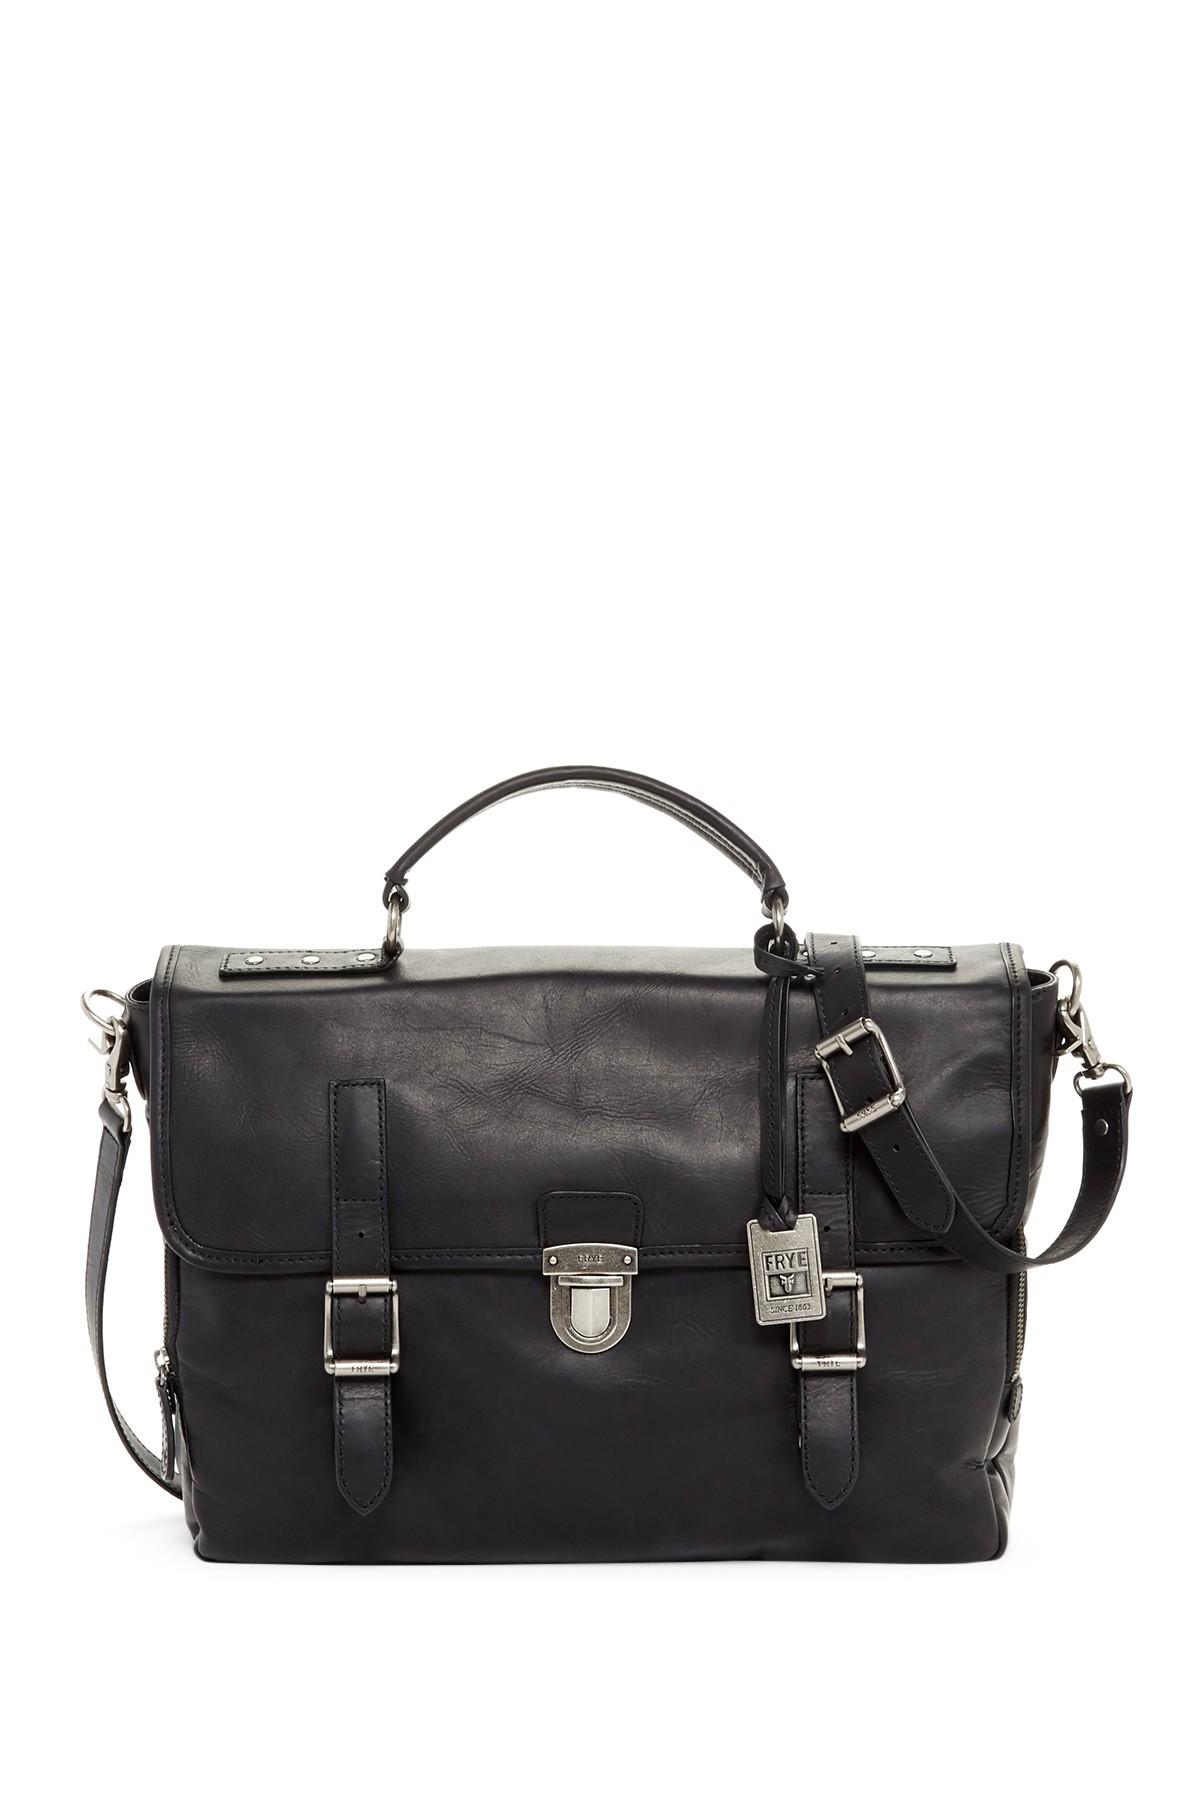 Frye Logan Leather Buckle Briefcase In Black For Men Lyst